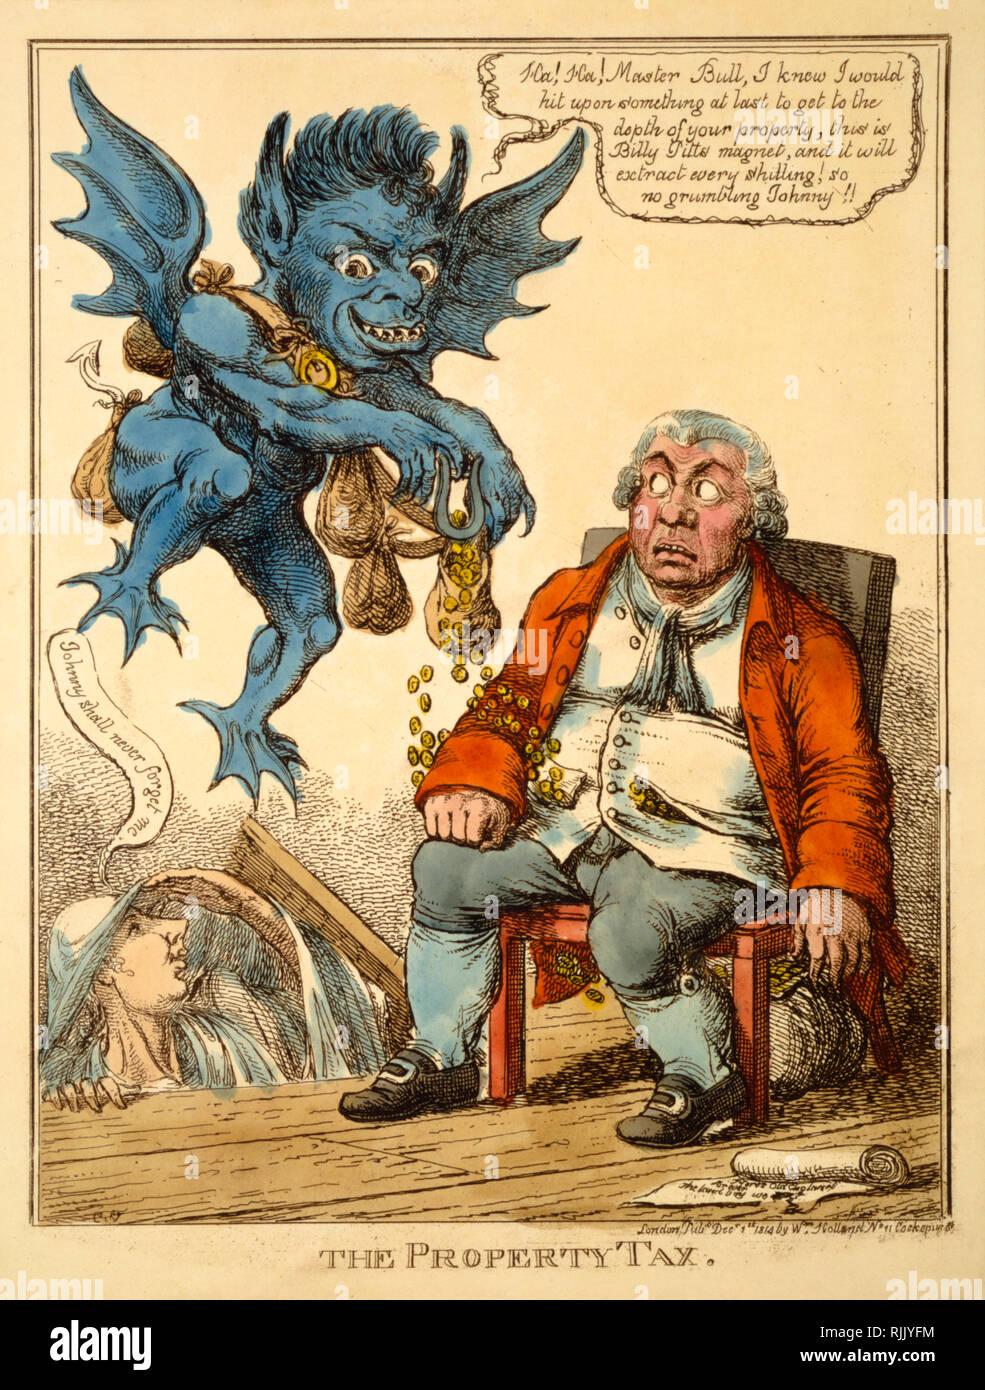 British Political Cartoon - C Williams 1814 - 'The Property Tax' - politics - Stock Image